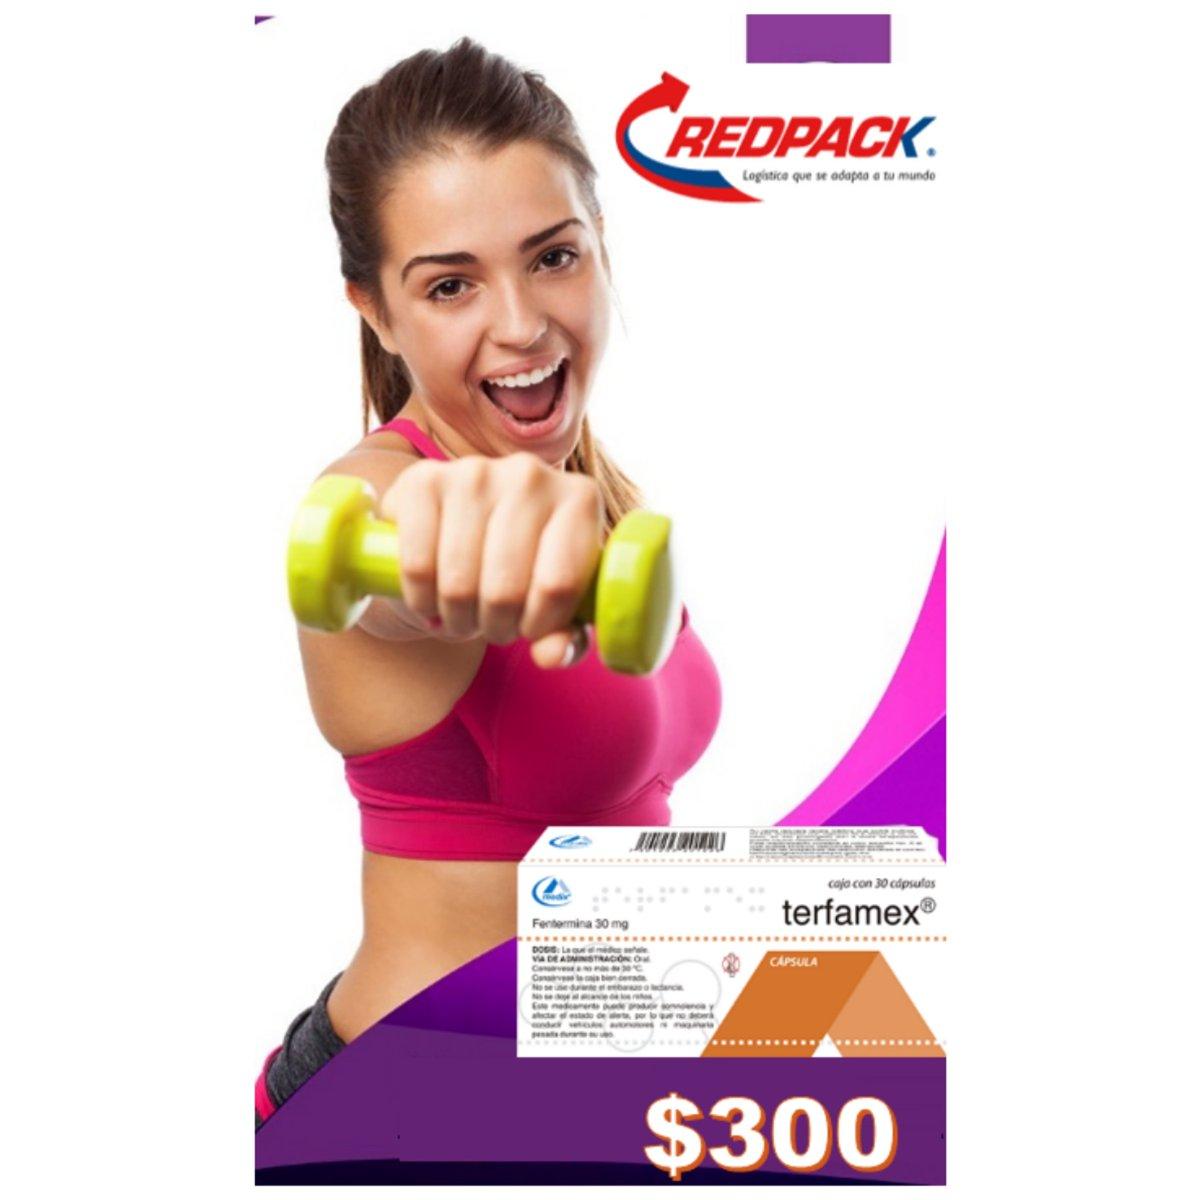 Terfamex fentermina Control de apetito GARANTIZADO para seguir la dieta estricta  #Tampico #Madero #Dieta #Obesidad #Fit #fitness #fitnessgirl #FitMom #Adelgazar #Tamaulipecos #UnidosXAtlas #DiablosTwitteros #salud #LigaMX #Jornada6 #SabadoDeGanarSeguidores #SalarioRosapic.twitter.com/r6rycS4qQ7